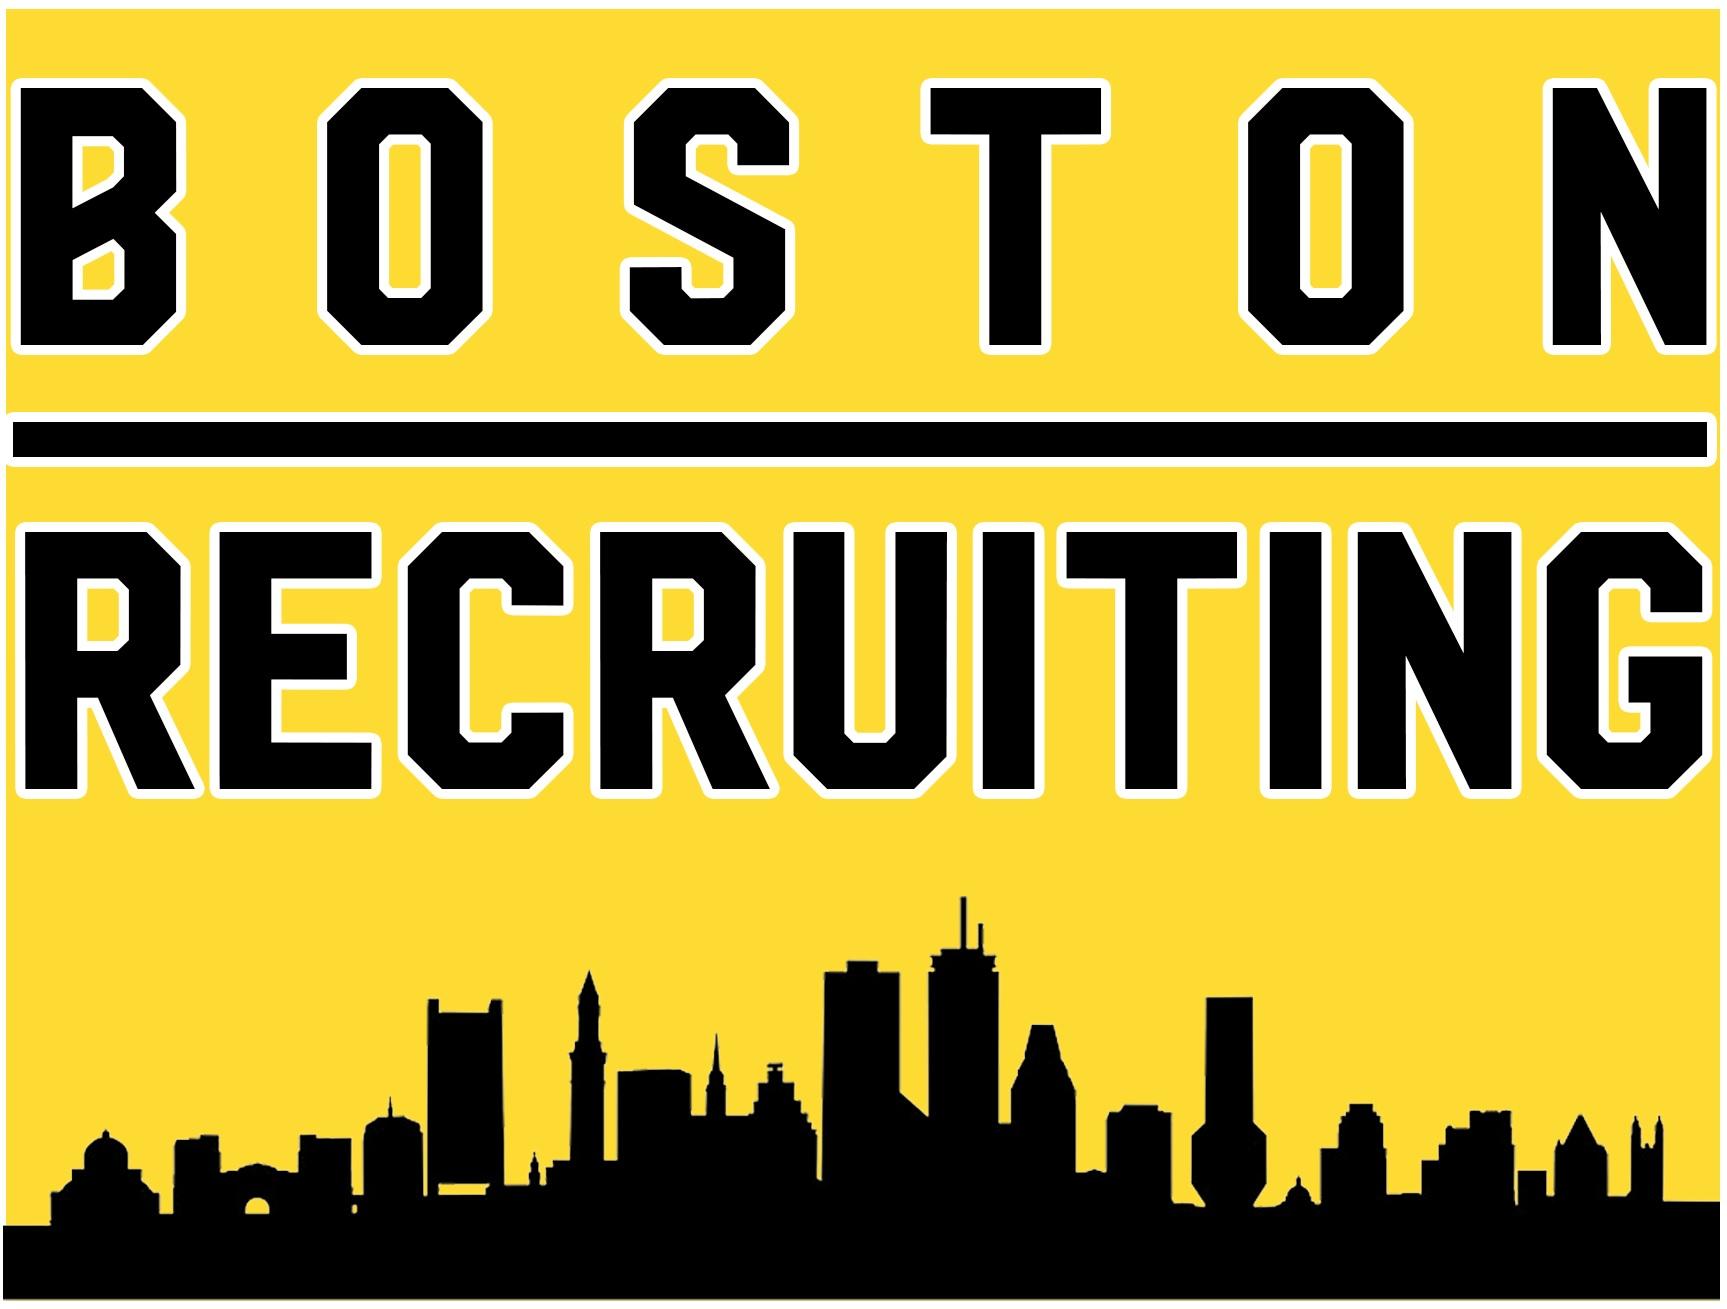 Boston Recruiting